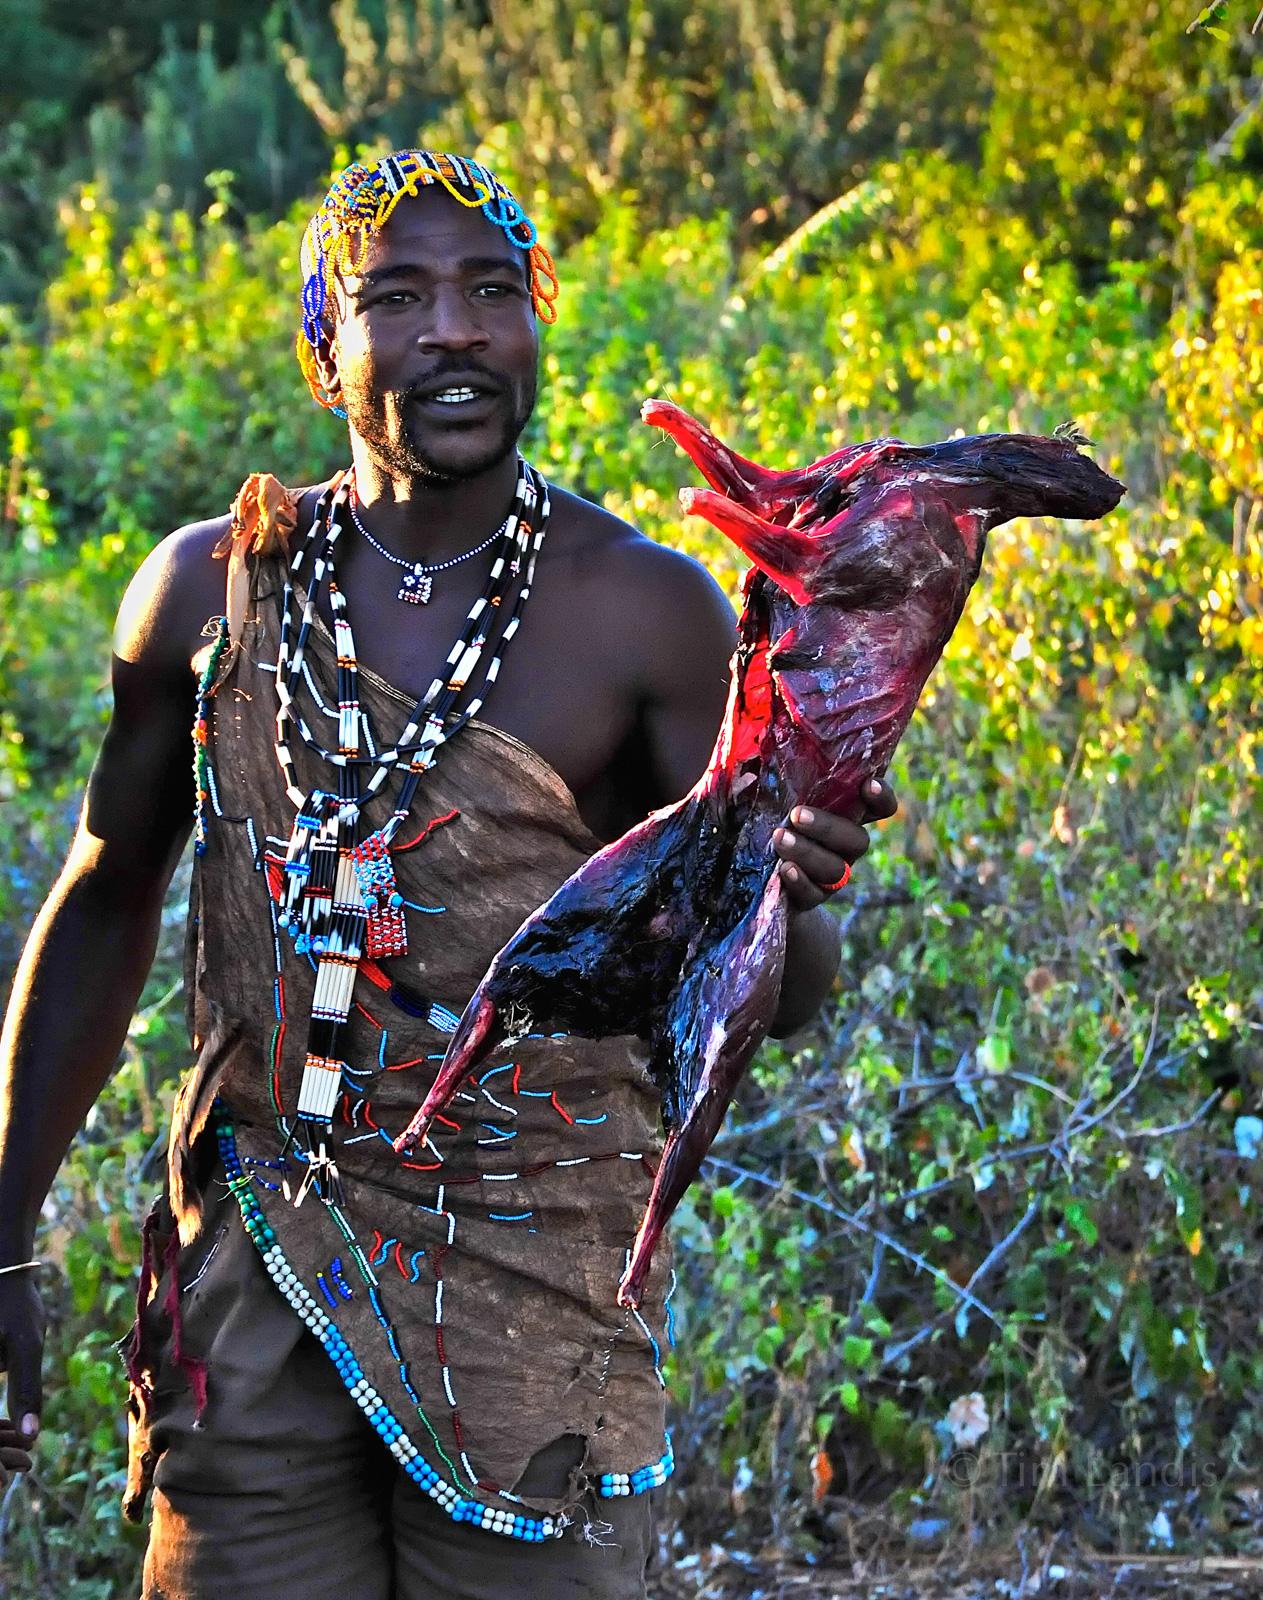 Bushman, Hadak, hunters, primative peoples, tribesman, wildman, photo